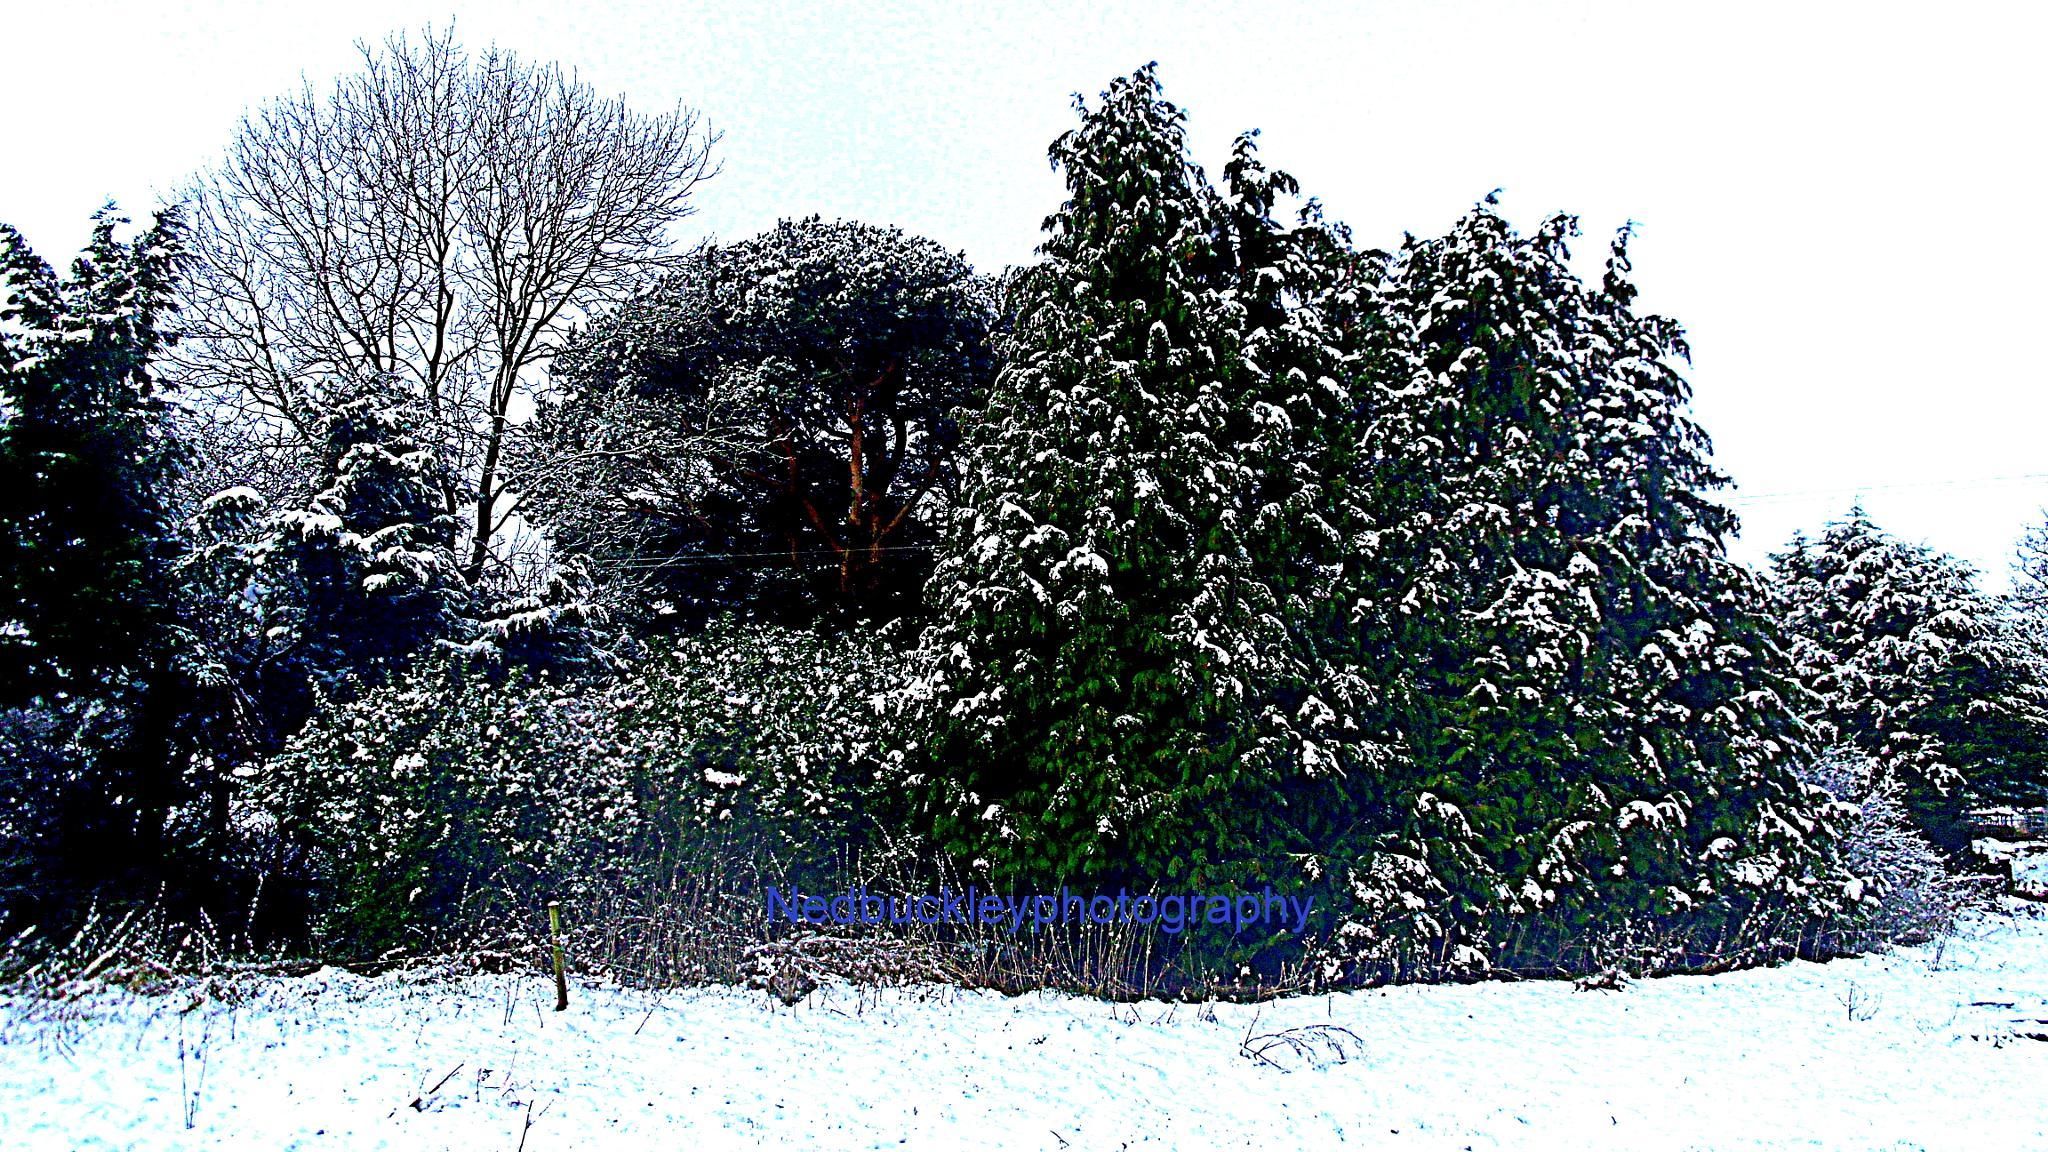 Snow Scene  by Nedbuckleyphotography